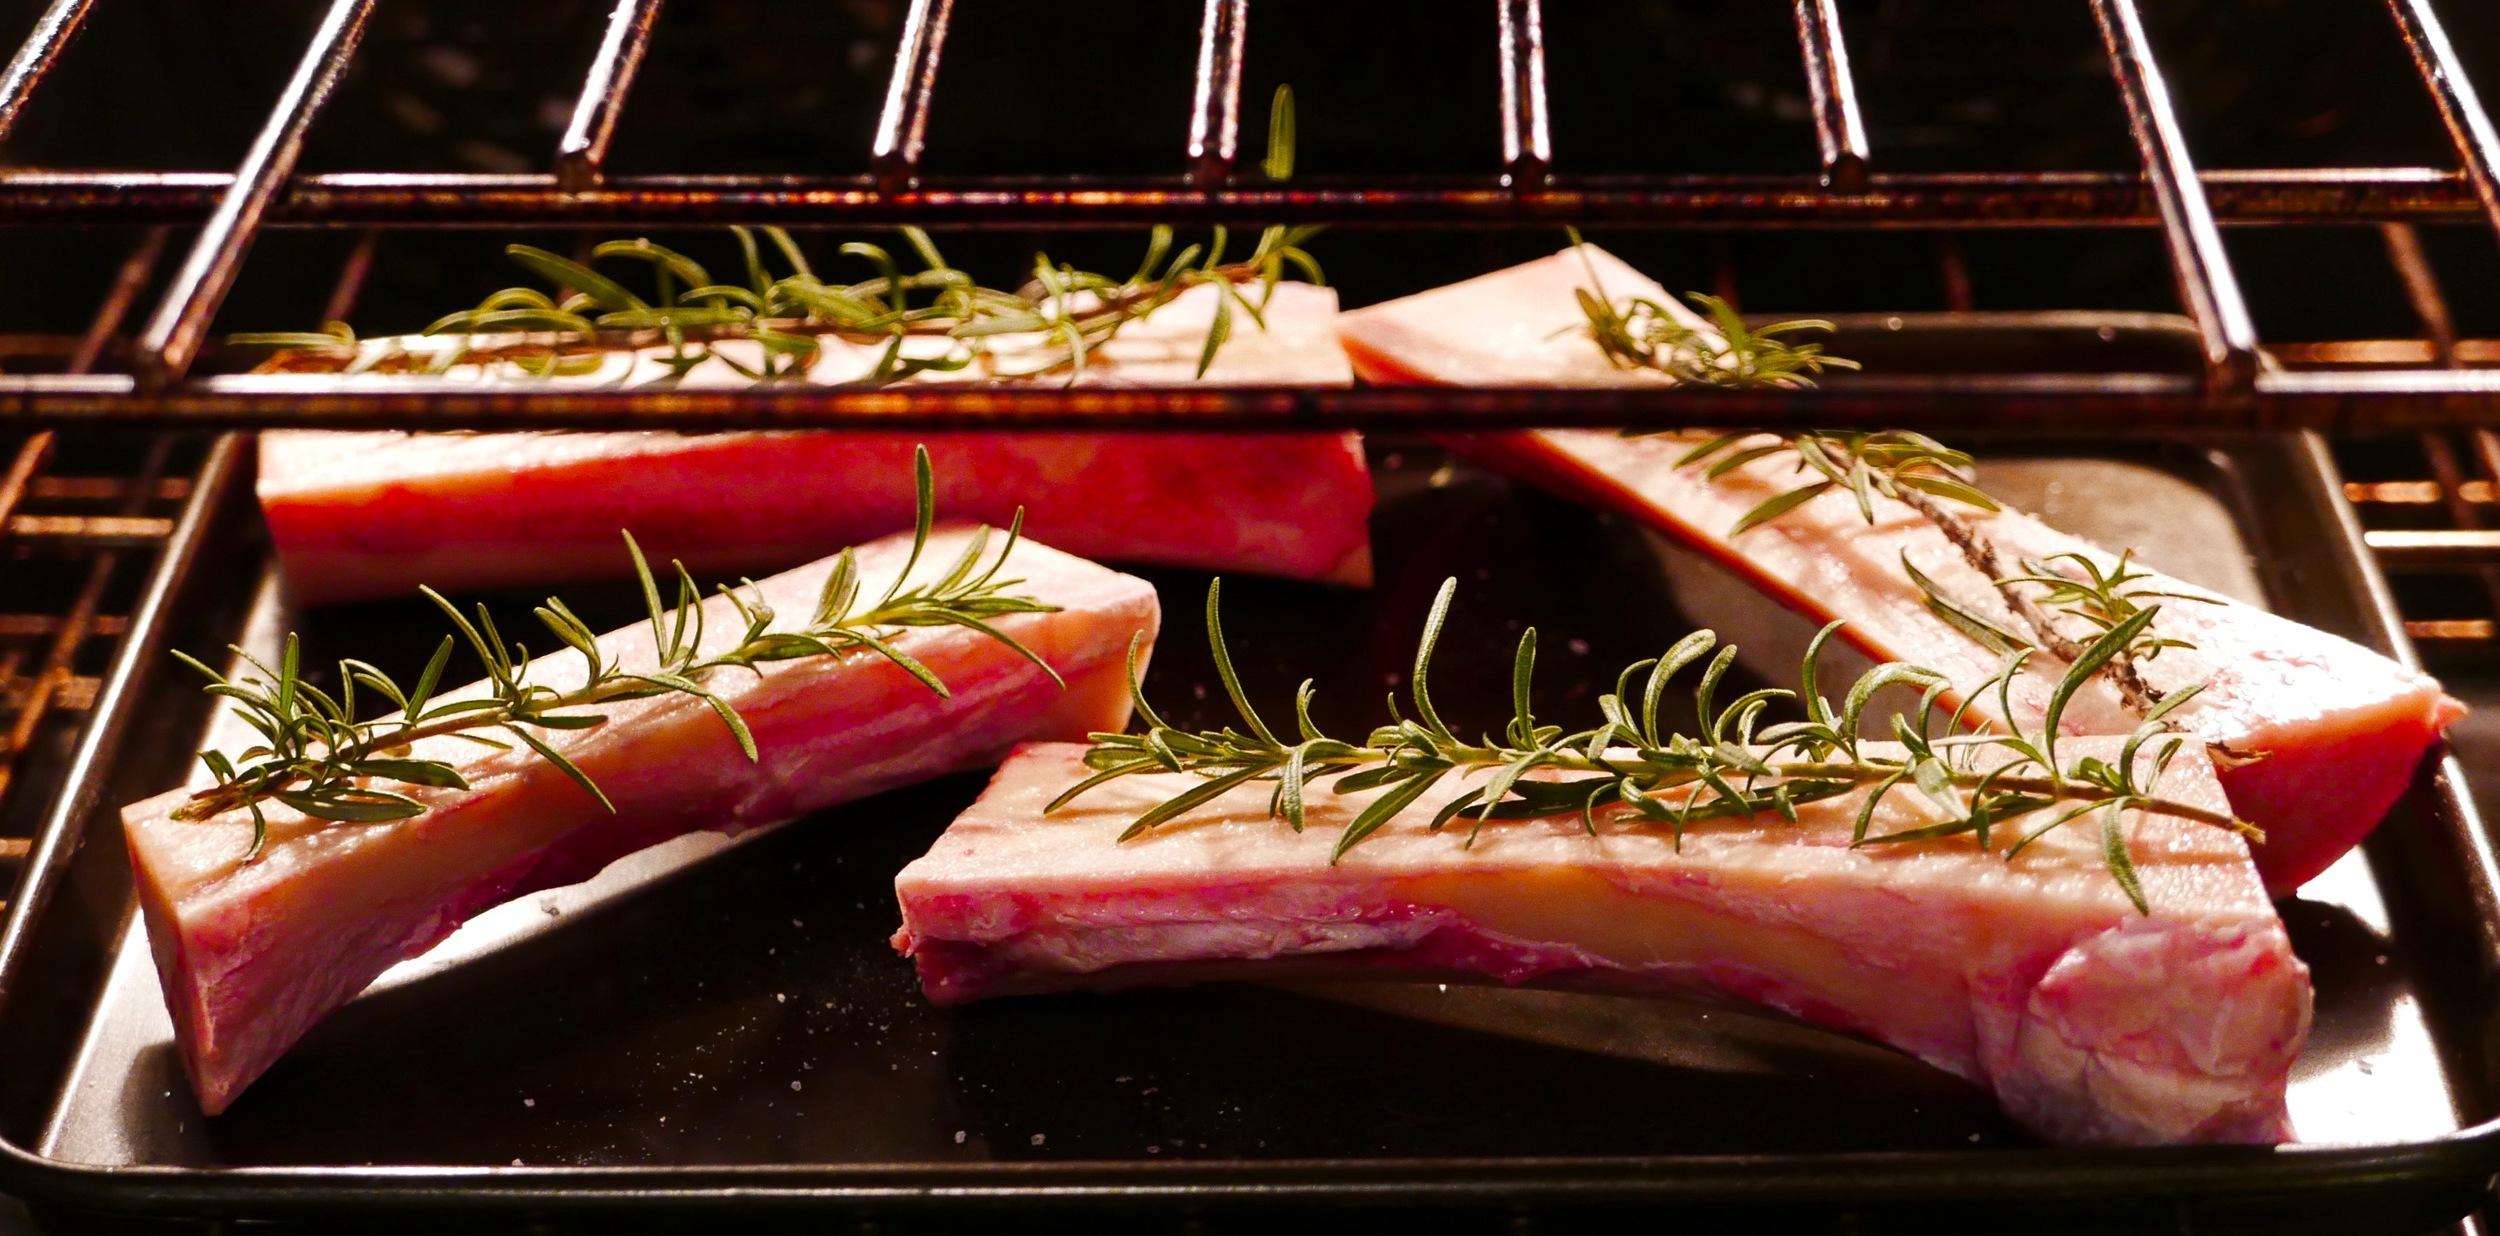 Bone marrow entering the oven